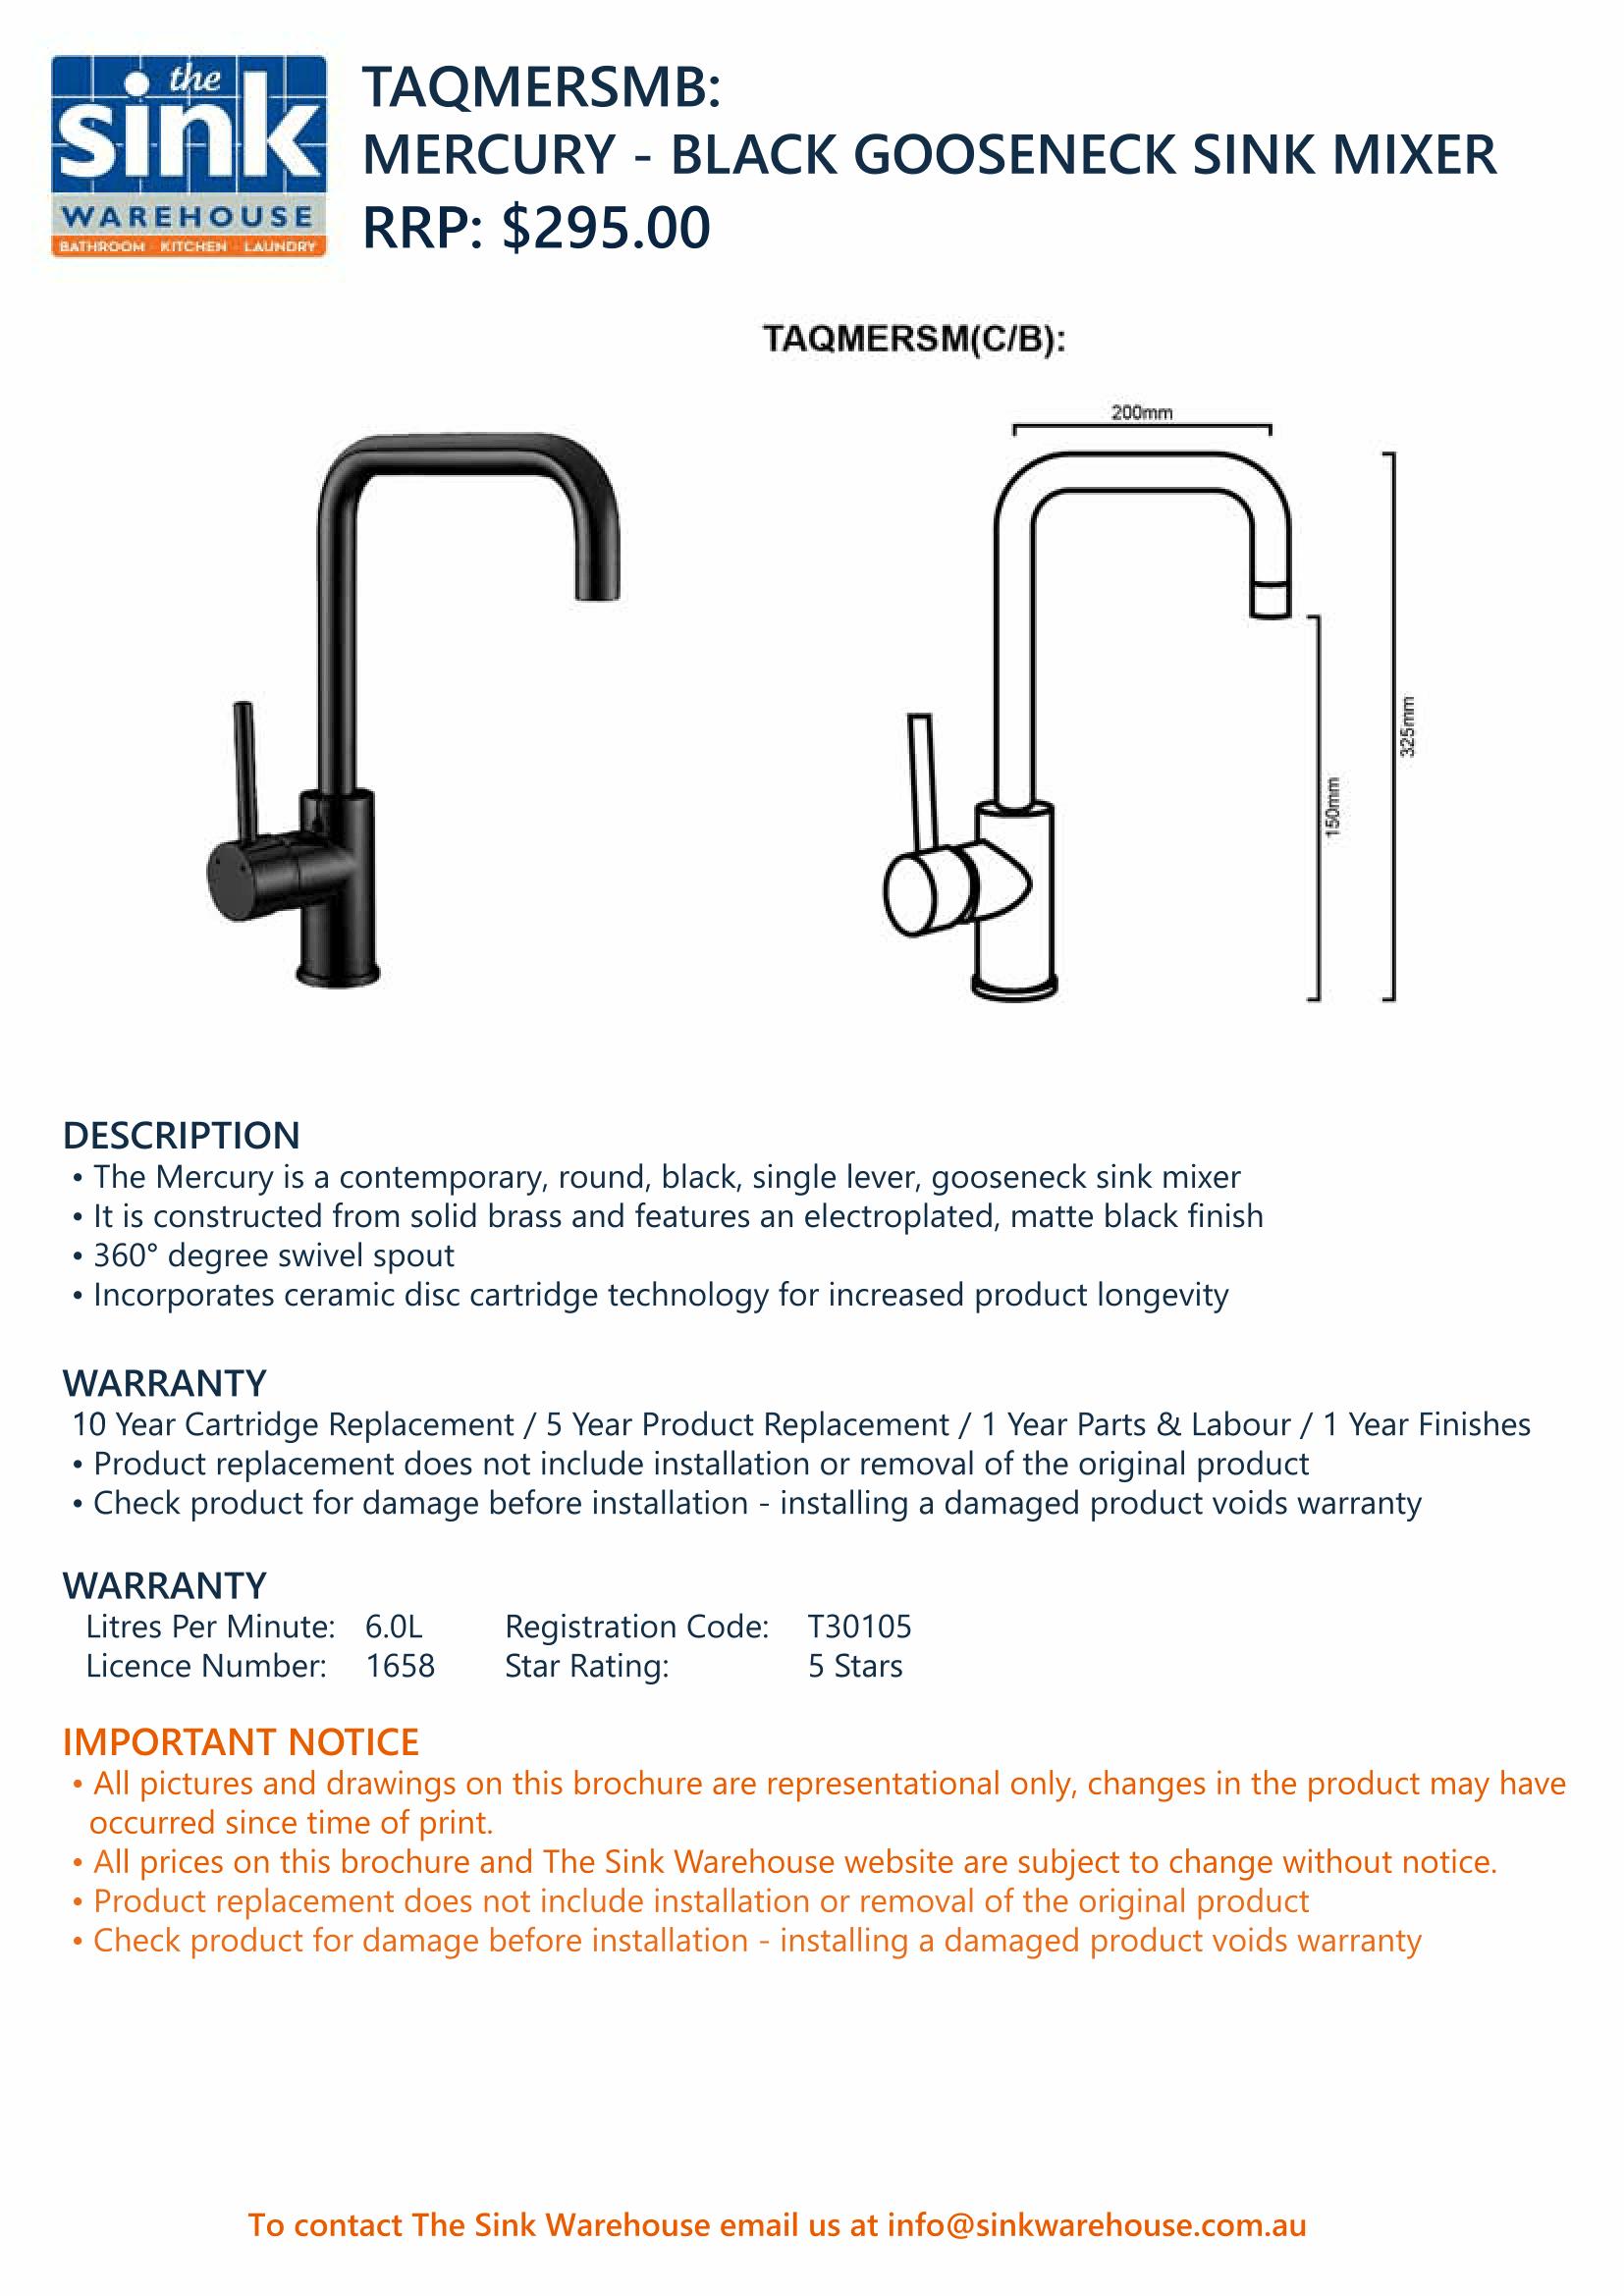 taqmersmb-product-spec-sheet-1.png